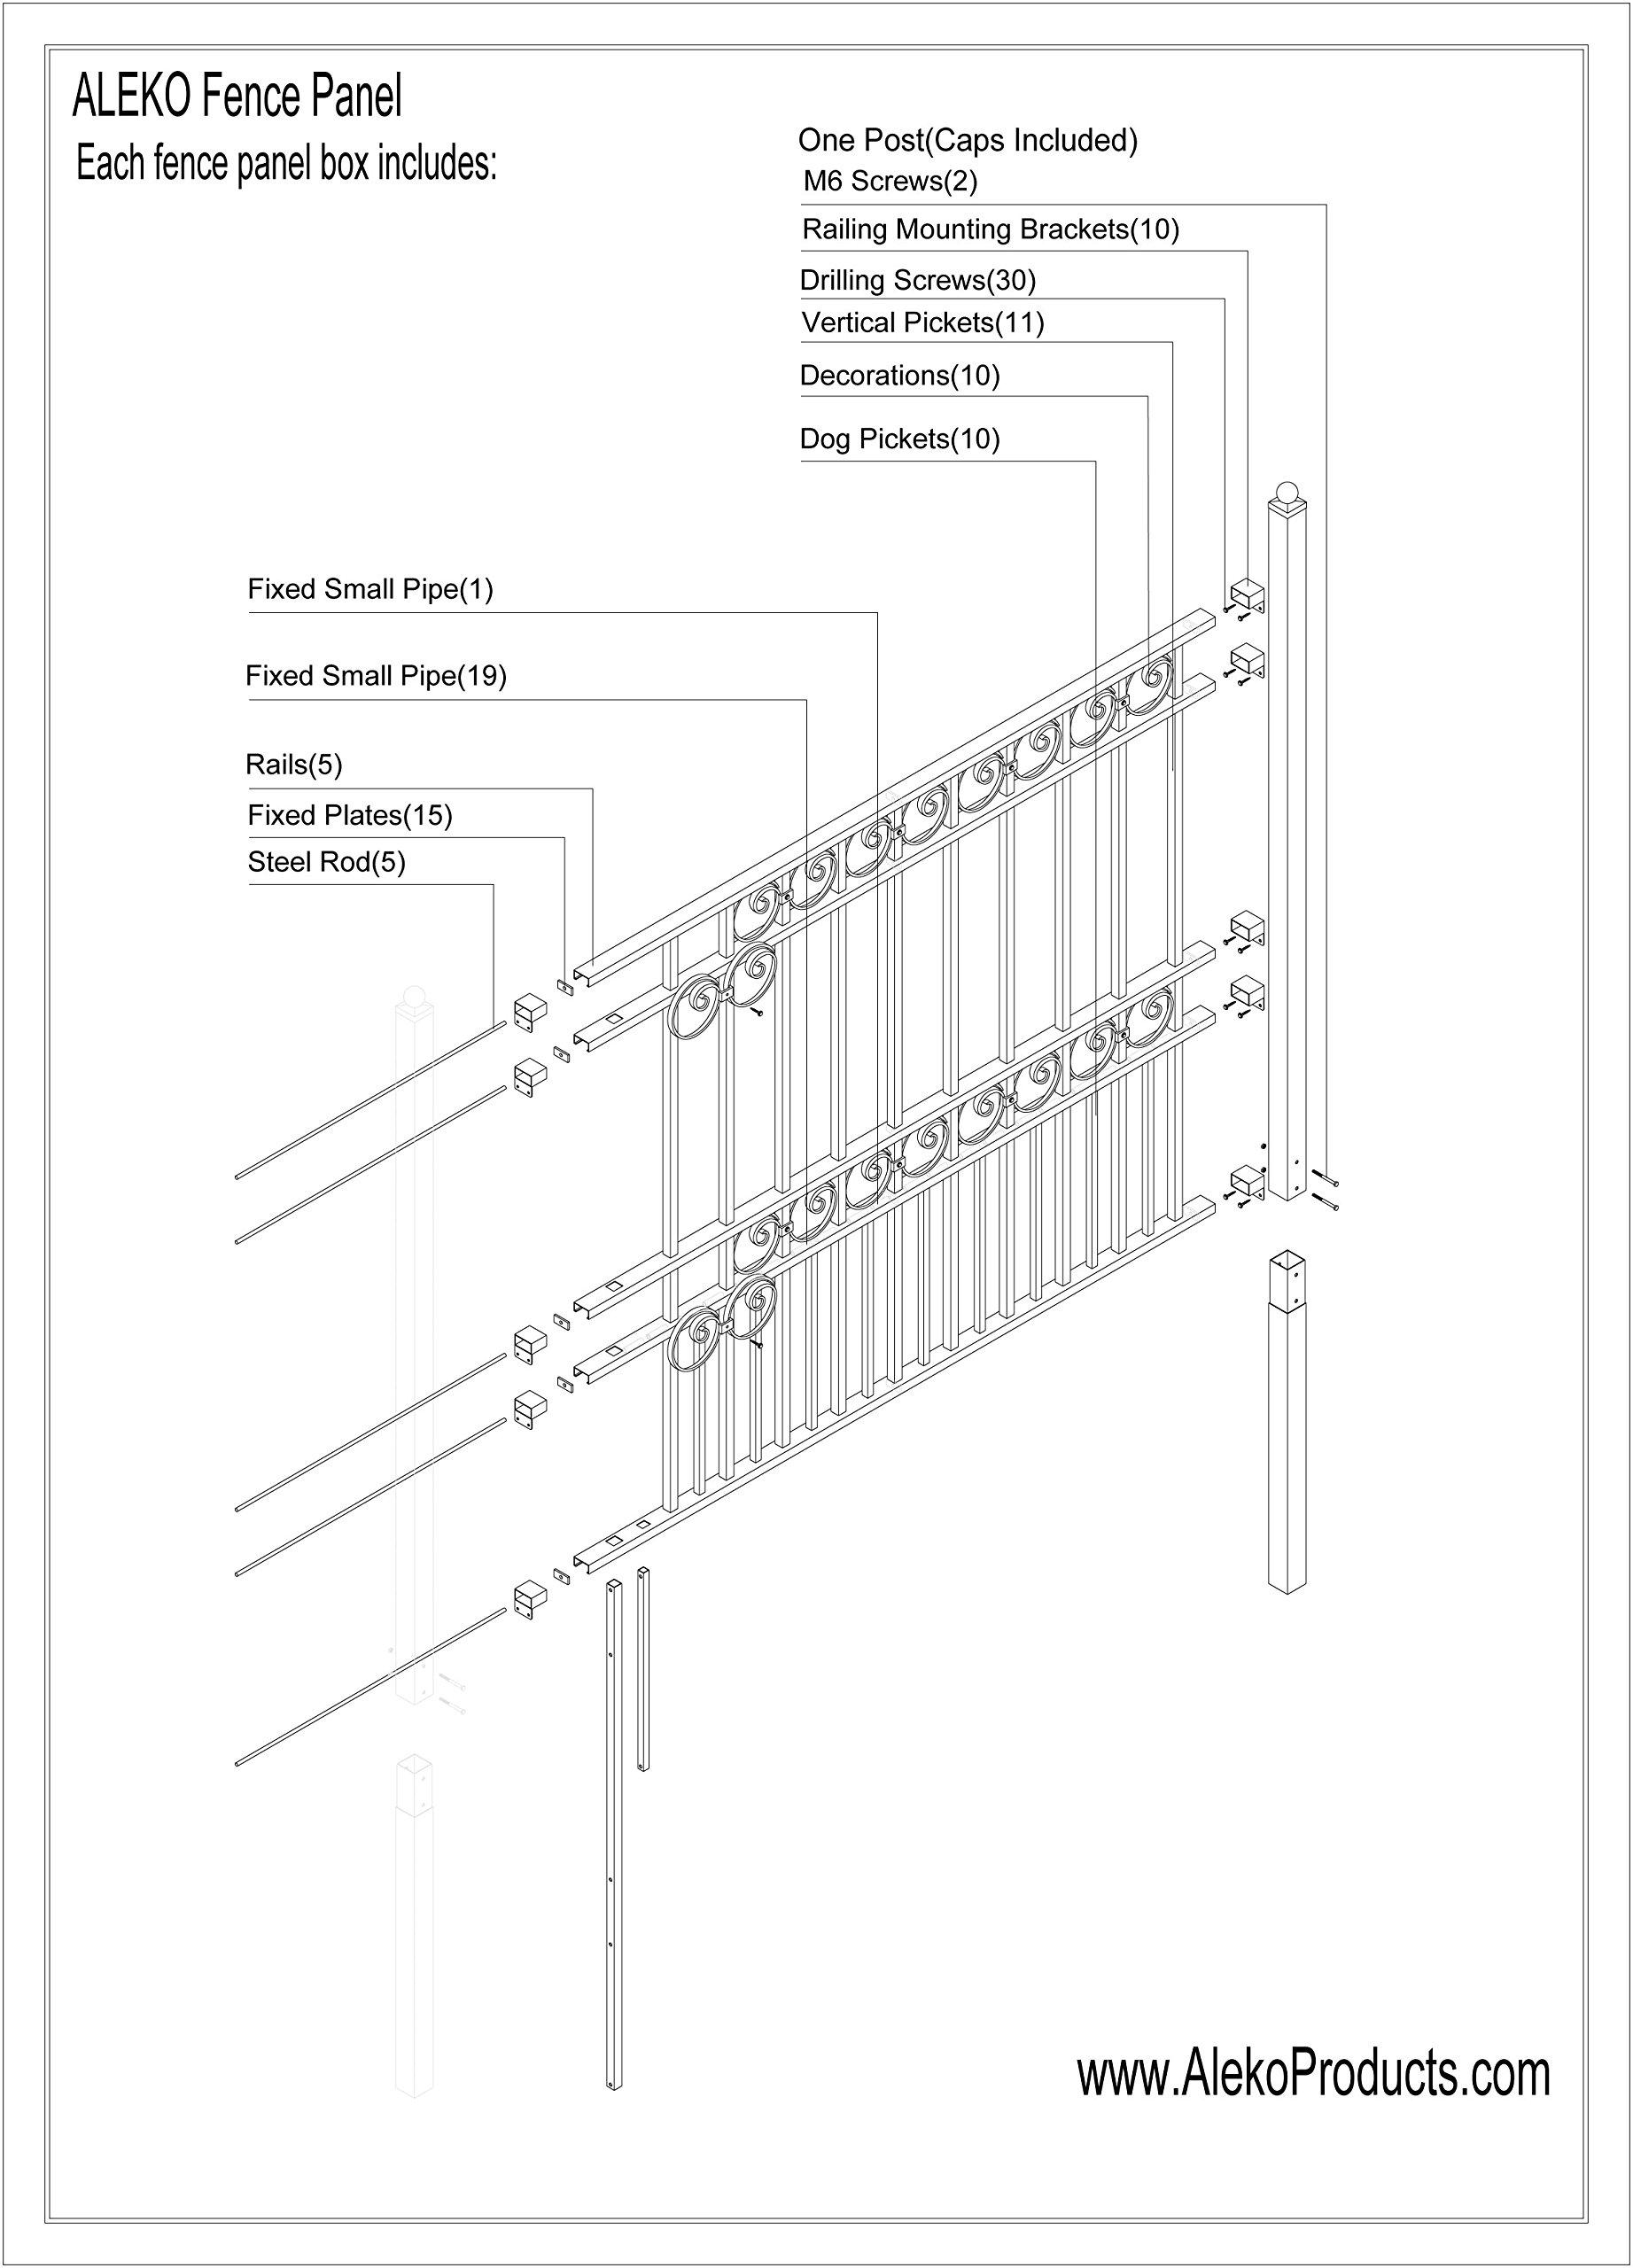 ALEKO Paris Style DIY Iron Wrought Steel Fence 5.5' X 5' Ornamental Fence